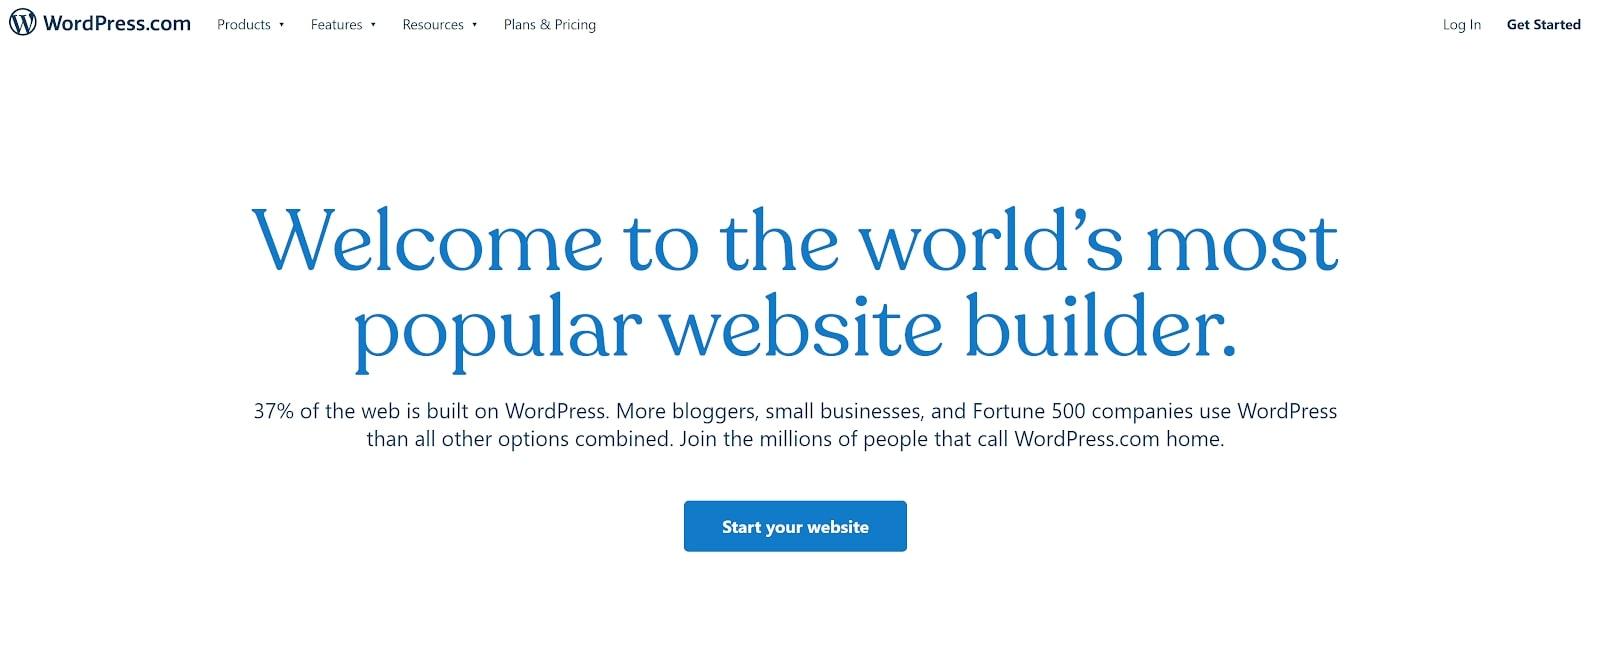 La page d'accueil de WordPress.com